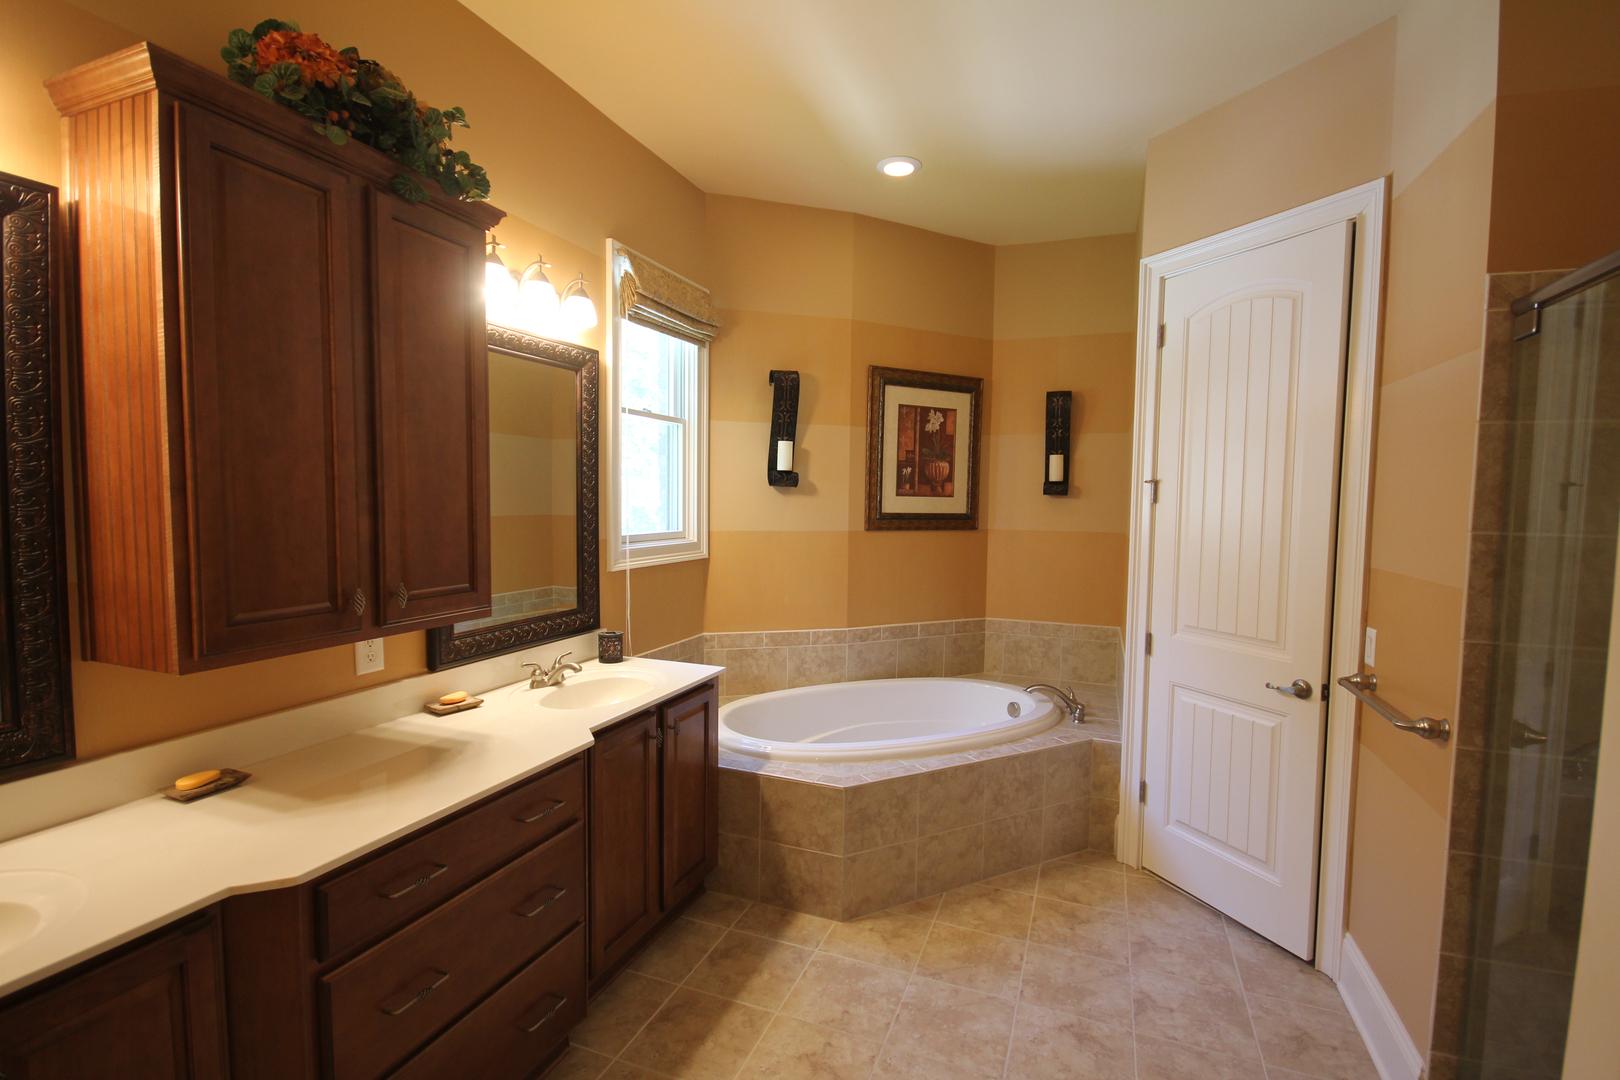 Faux painting bathroom - Faux Painting Bathroom 7